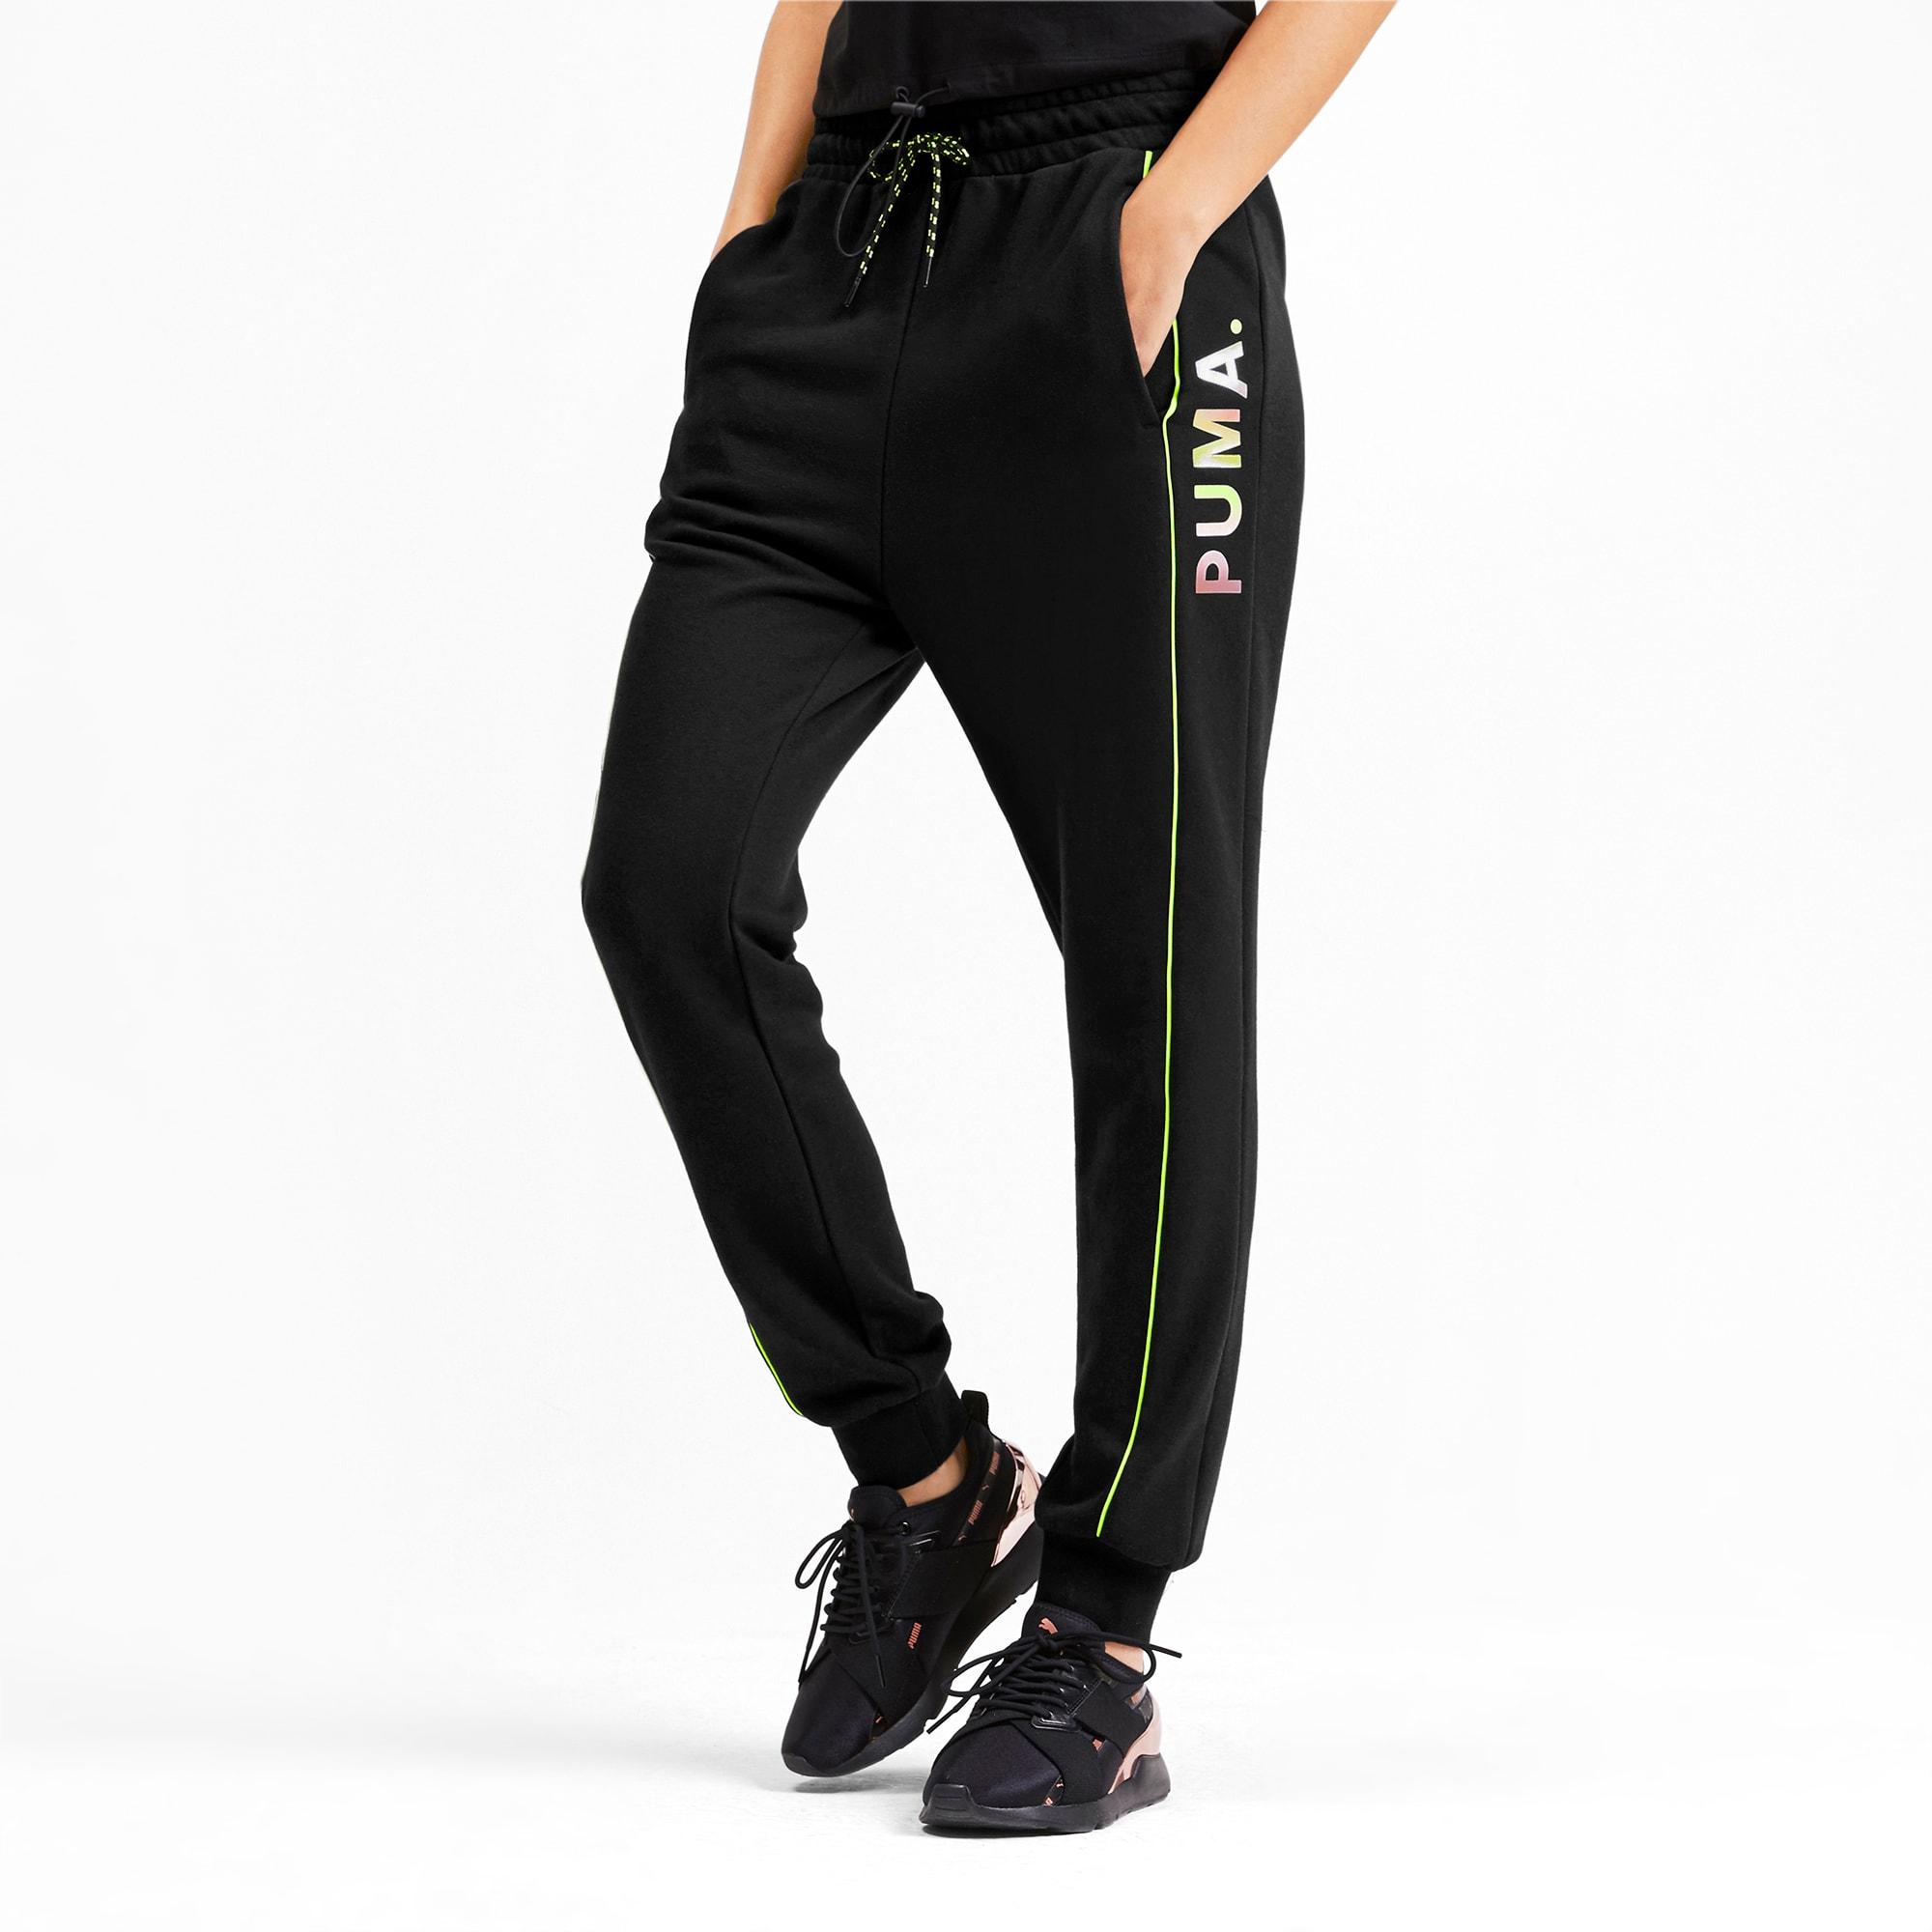 Chase Damen Sweatpants | Puma Black | PUMA Back to School